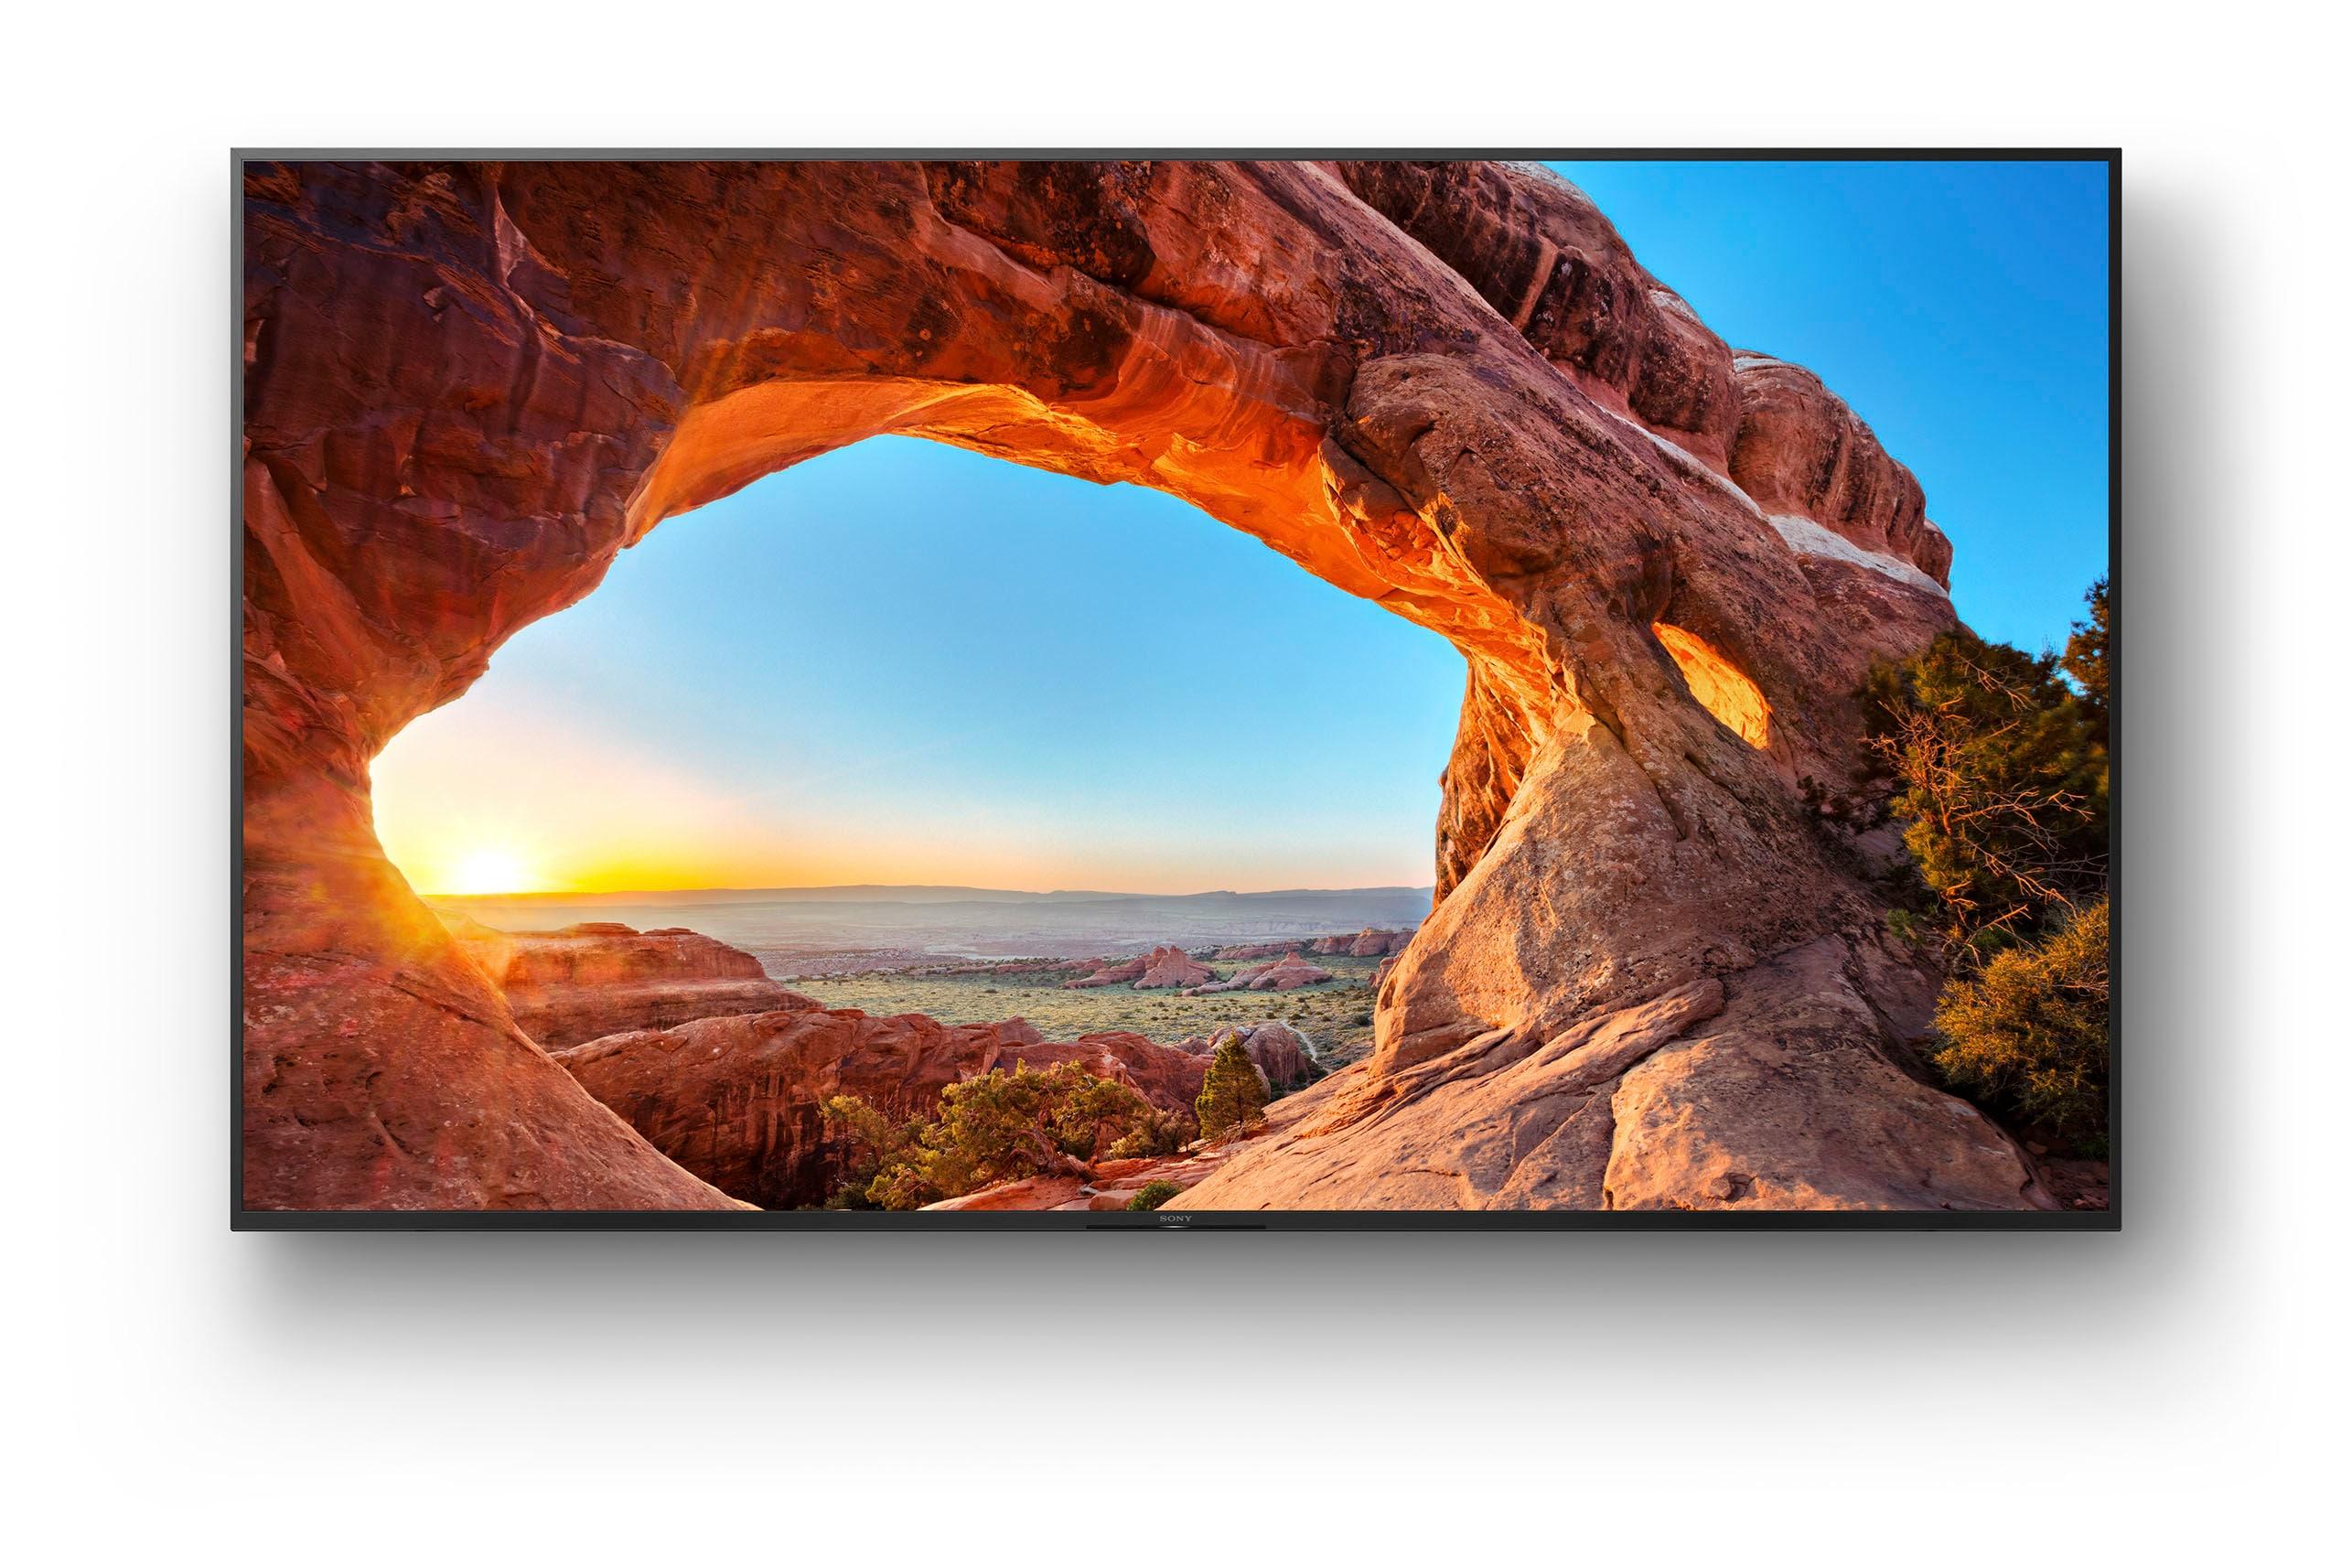 Sony LCD-LED Fernseher KD-85X85J , 215 cm 85 , 4K Ultra HD, Smart-TV, Smart TV